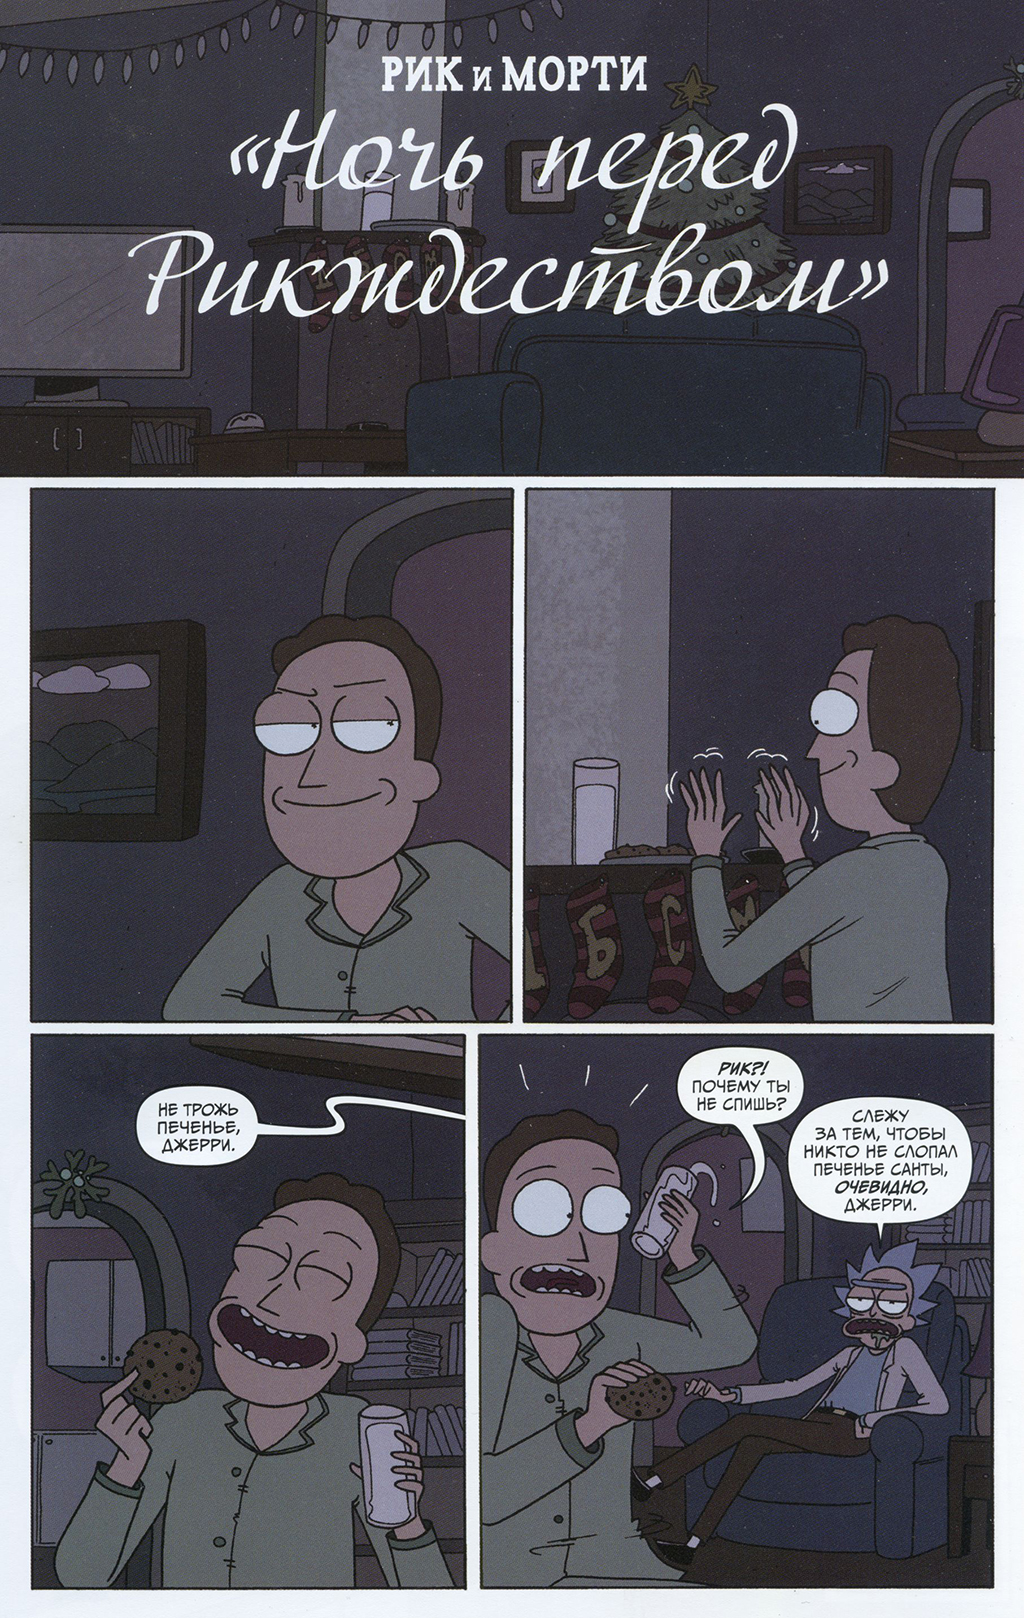 Комикс Рик и Морти - Ночь перед Рикждеством